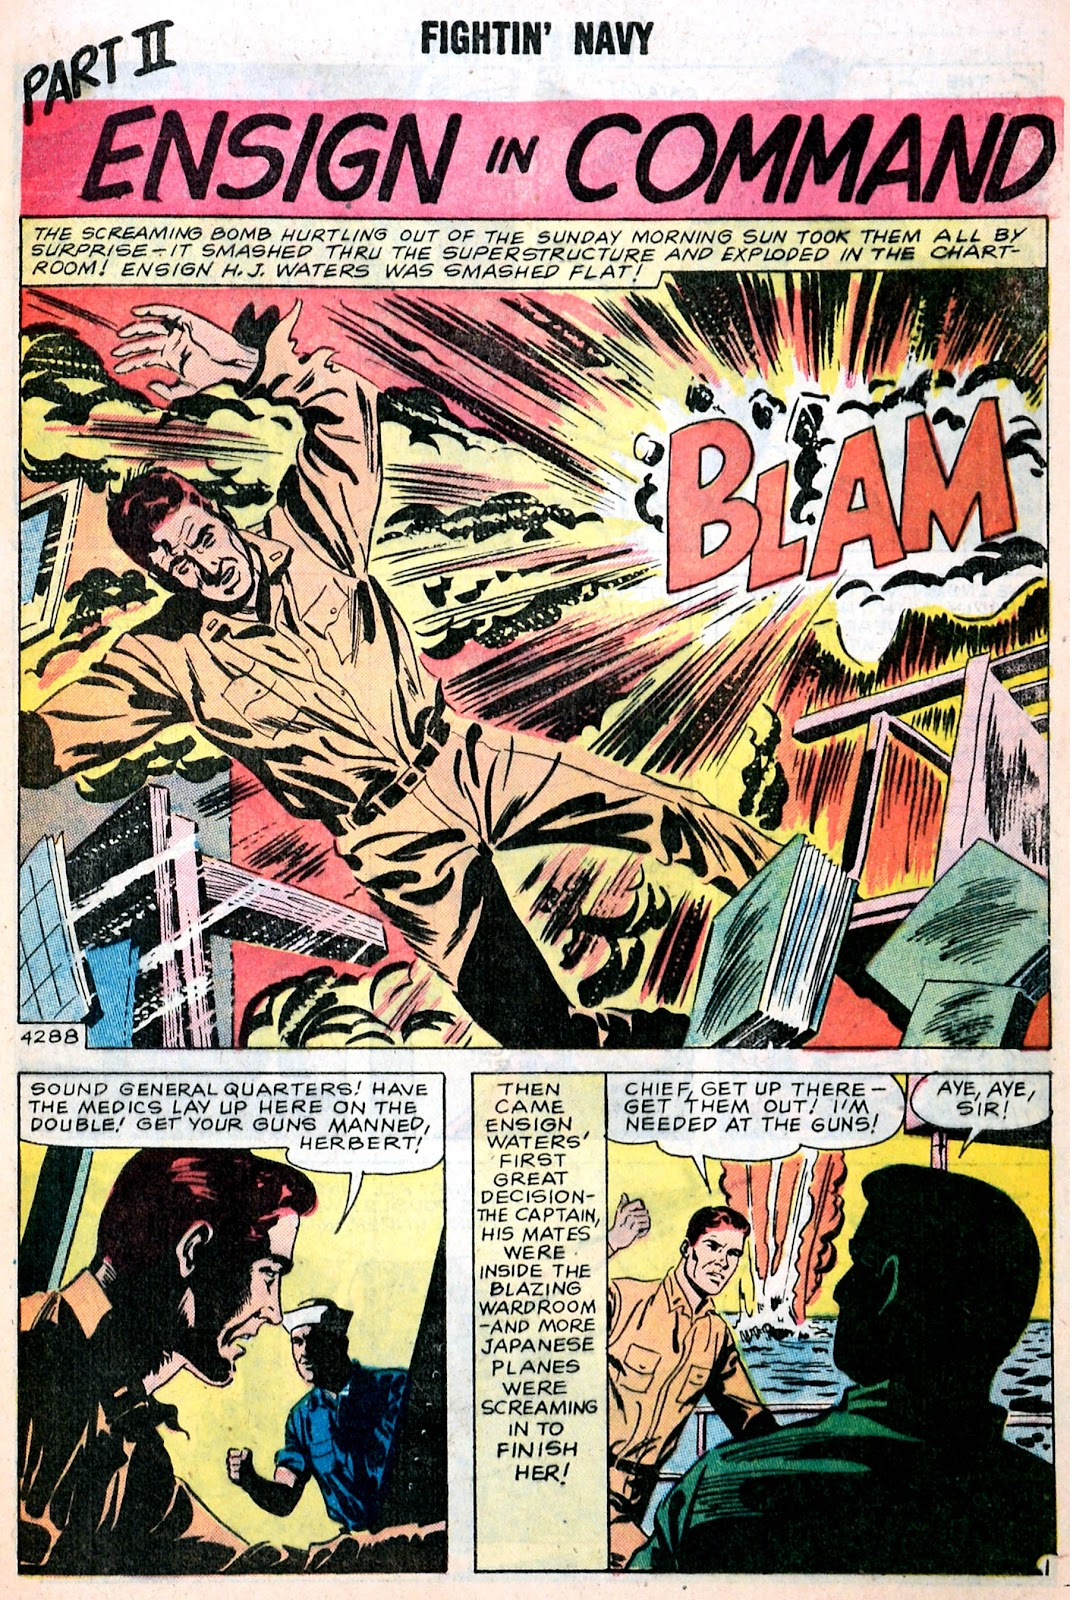 Read online Fightin' Navy comic -  Issue #85 - 9